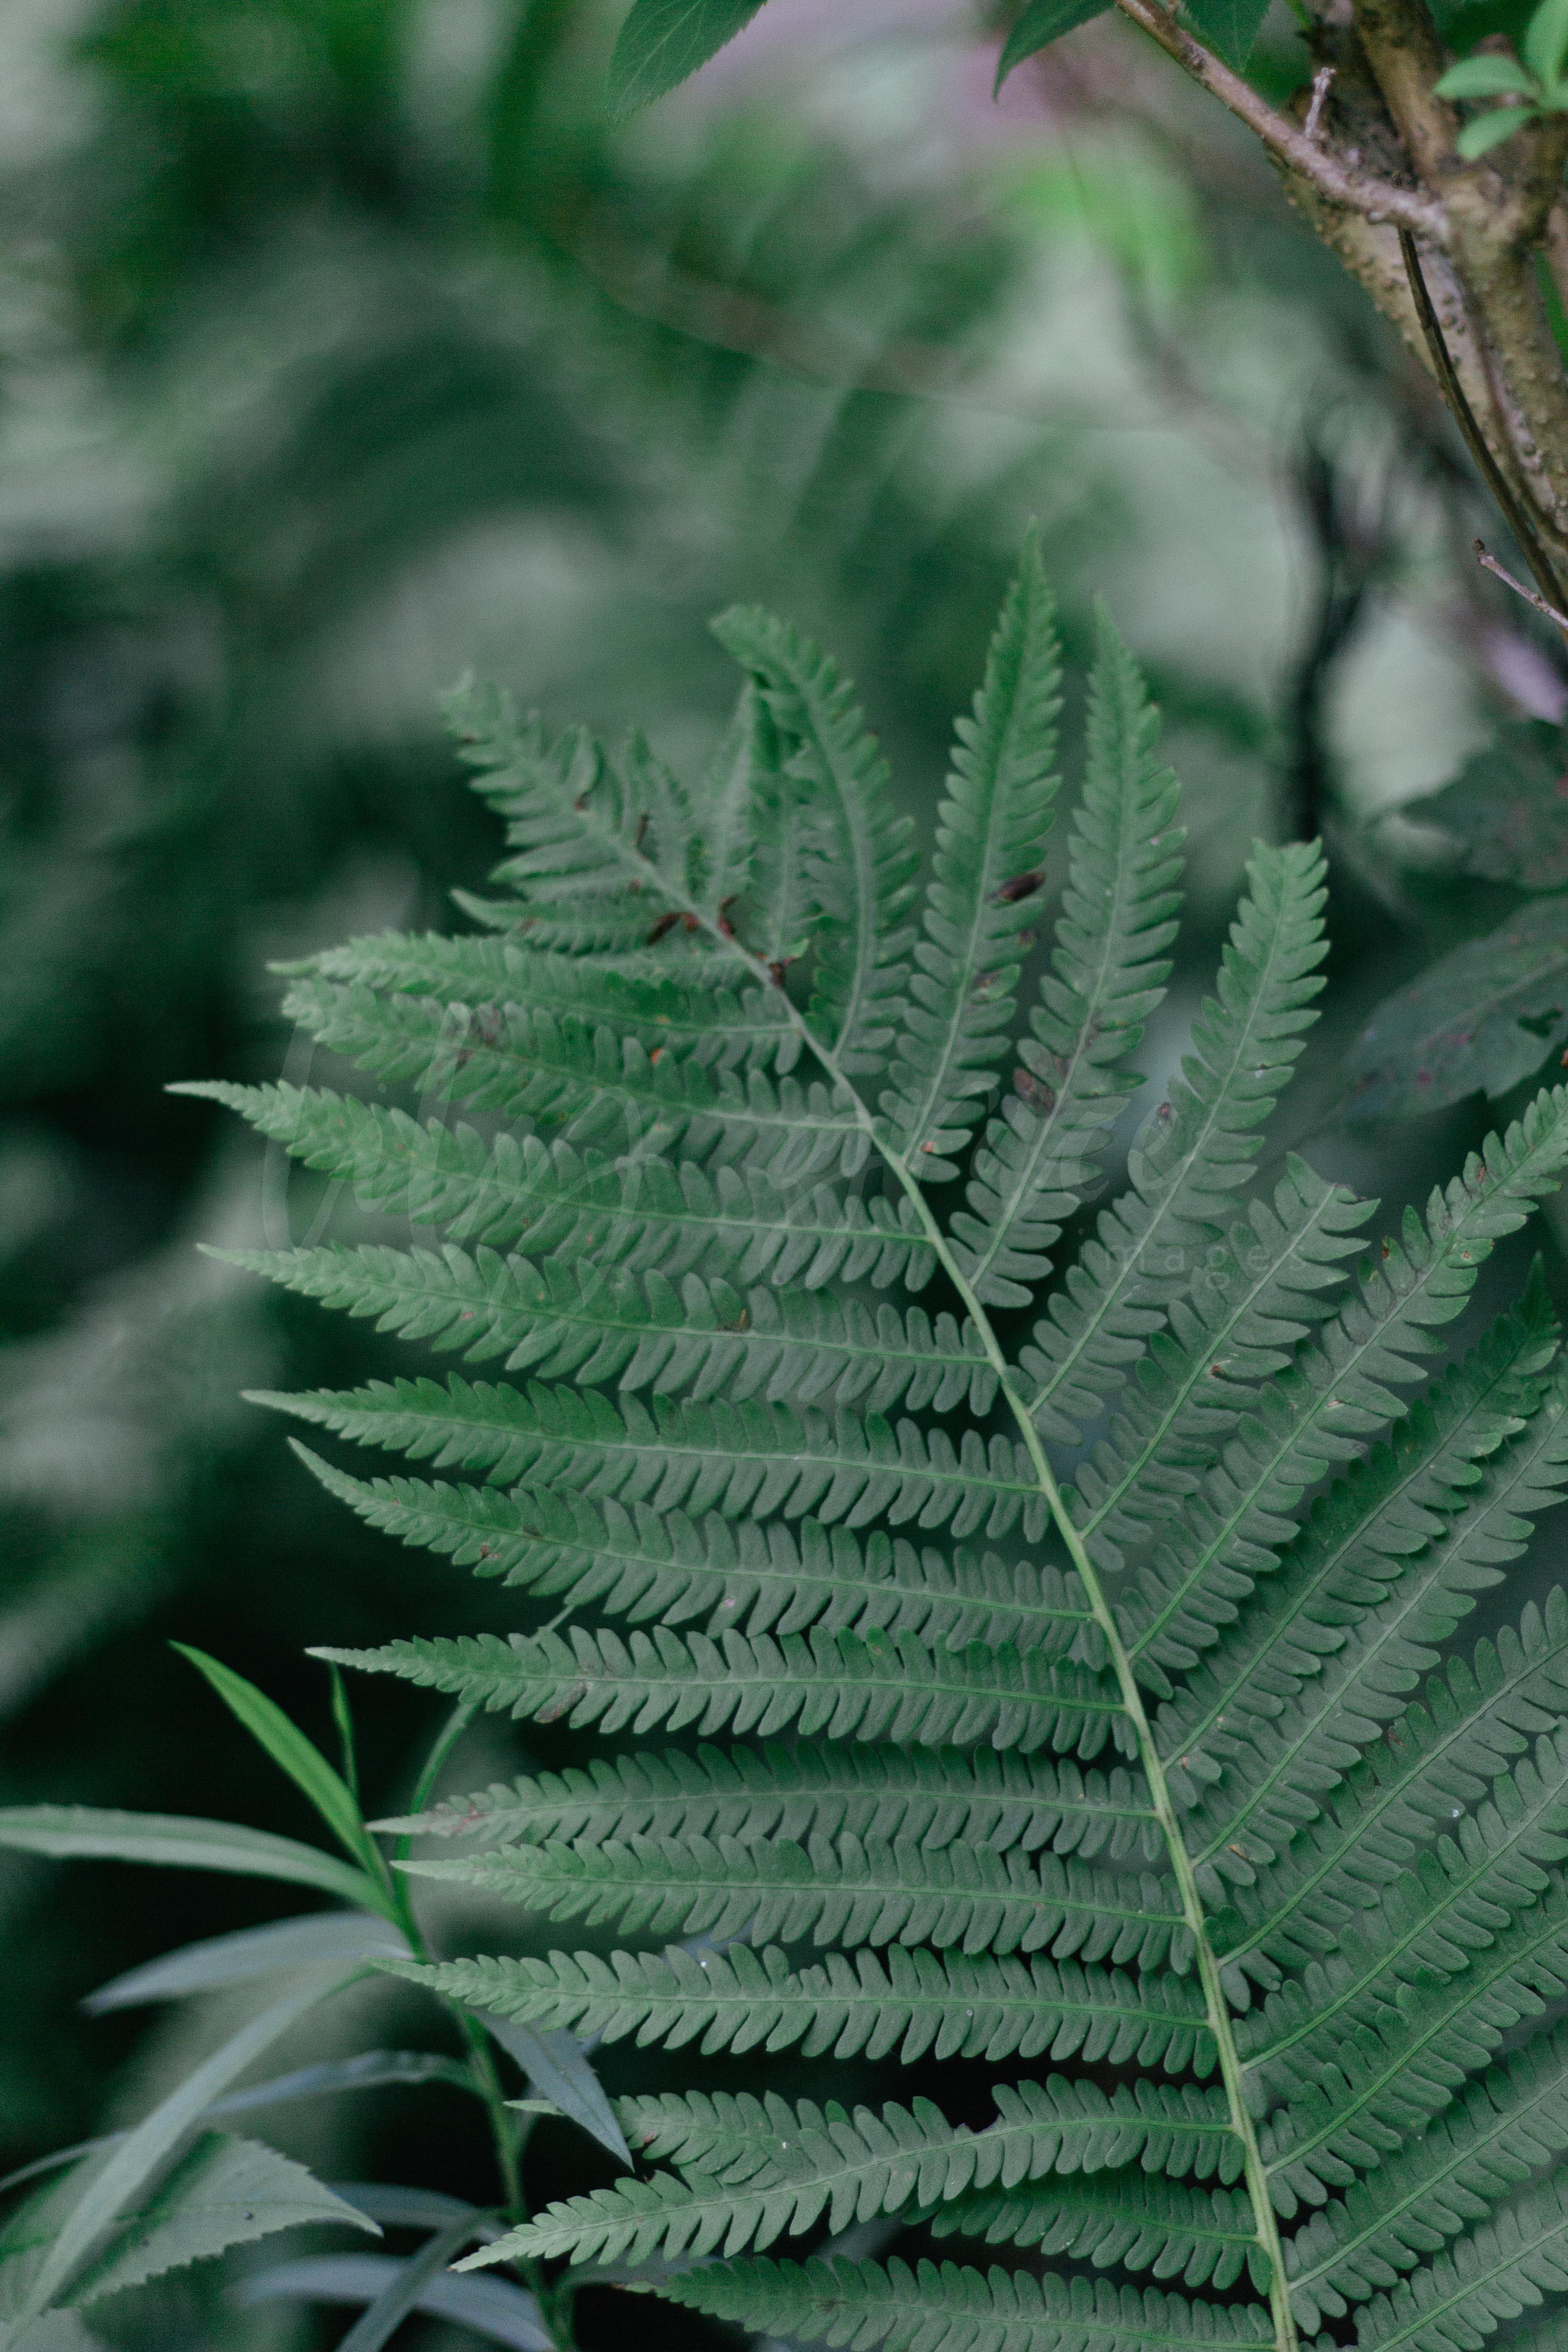 barrie stock photography, barrie, stock photos, photos for instagram, real photos, lilygrace images, toronto stock photography, greenery, photography, fern, green, garden photography, garden